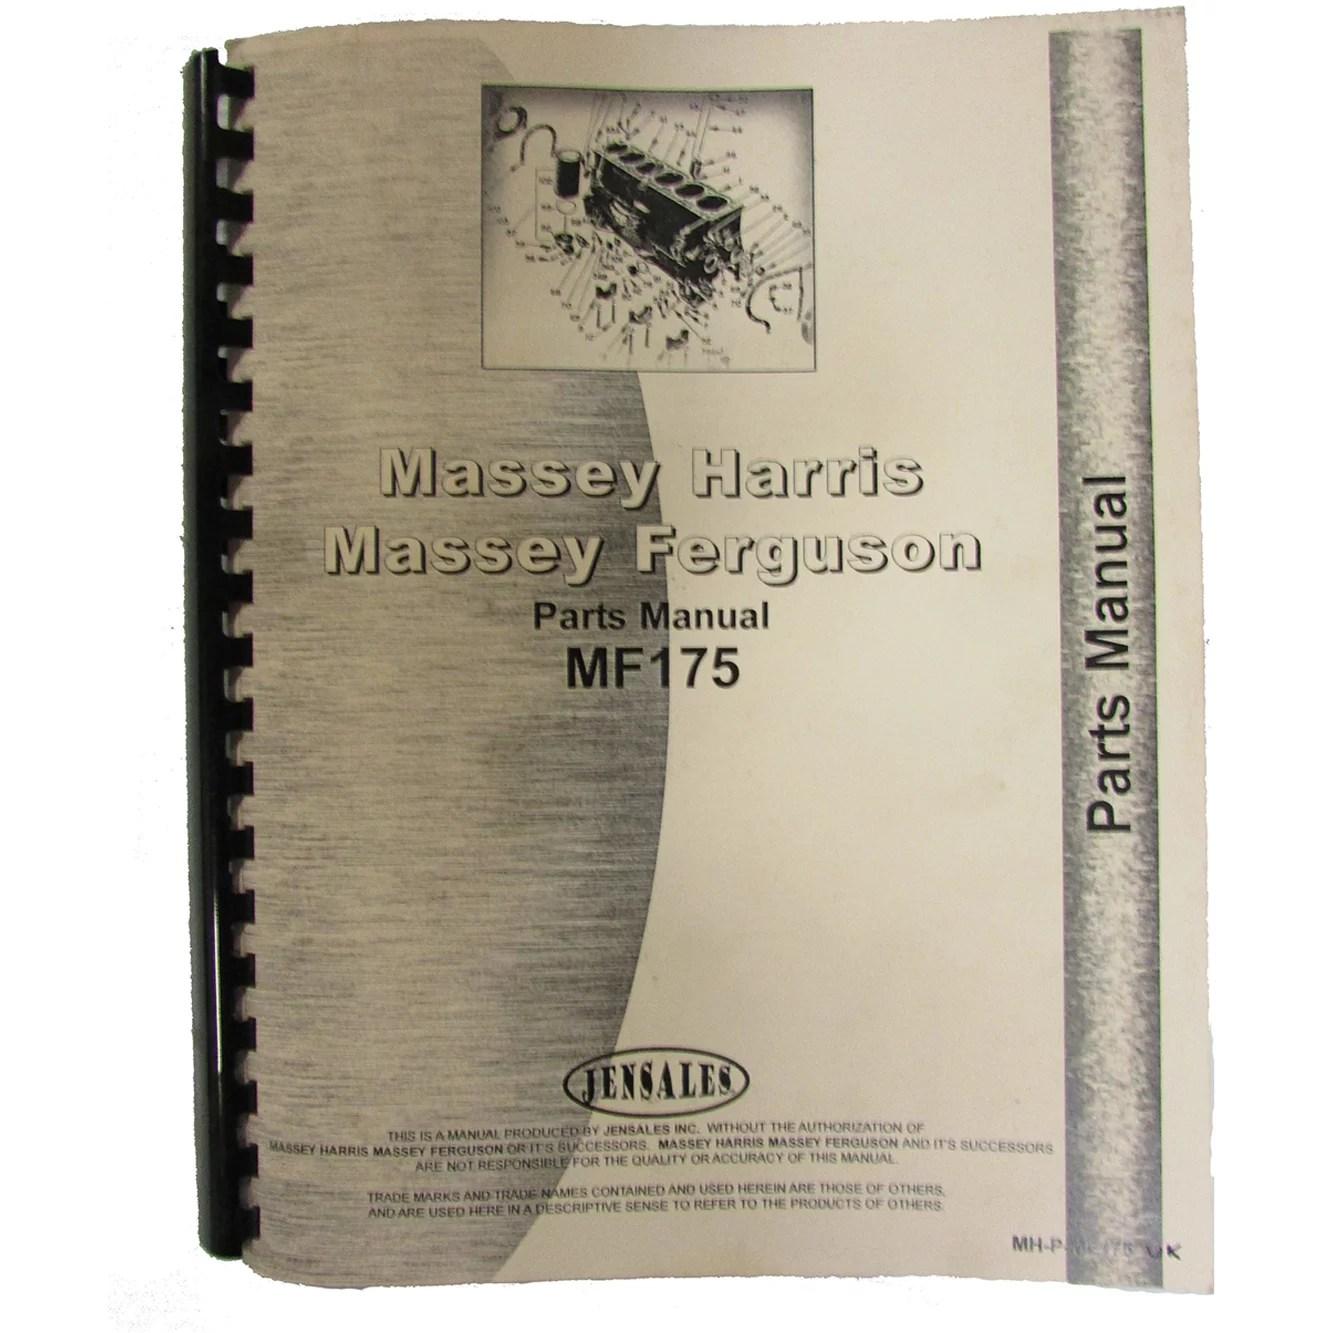 massey ferguson 175 parts diagram rockford p3 wiring manual for diesel uk 178 mh p mf175